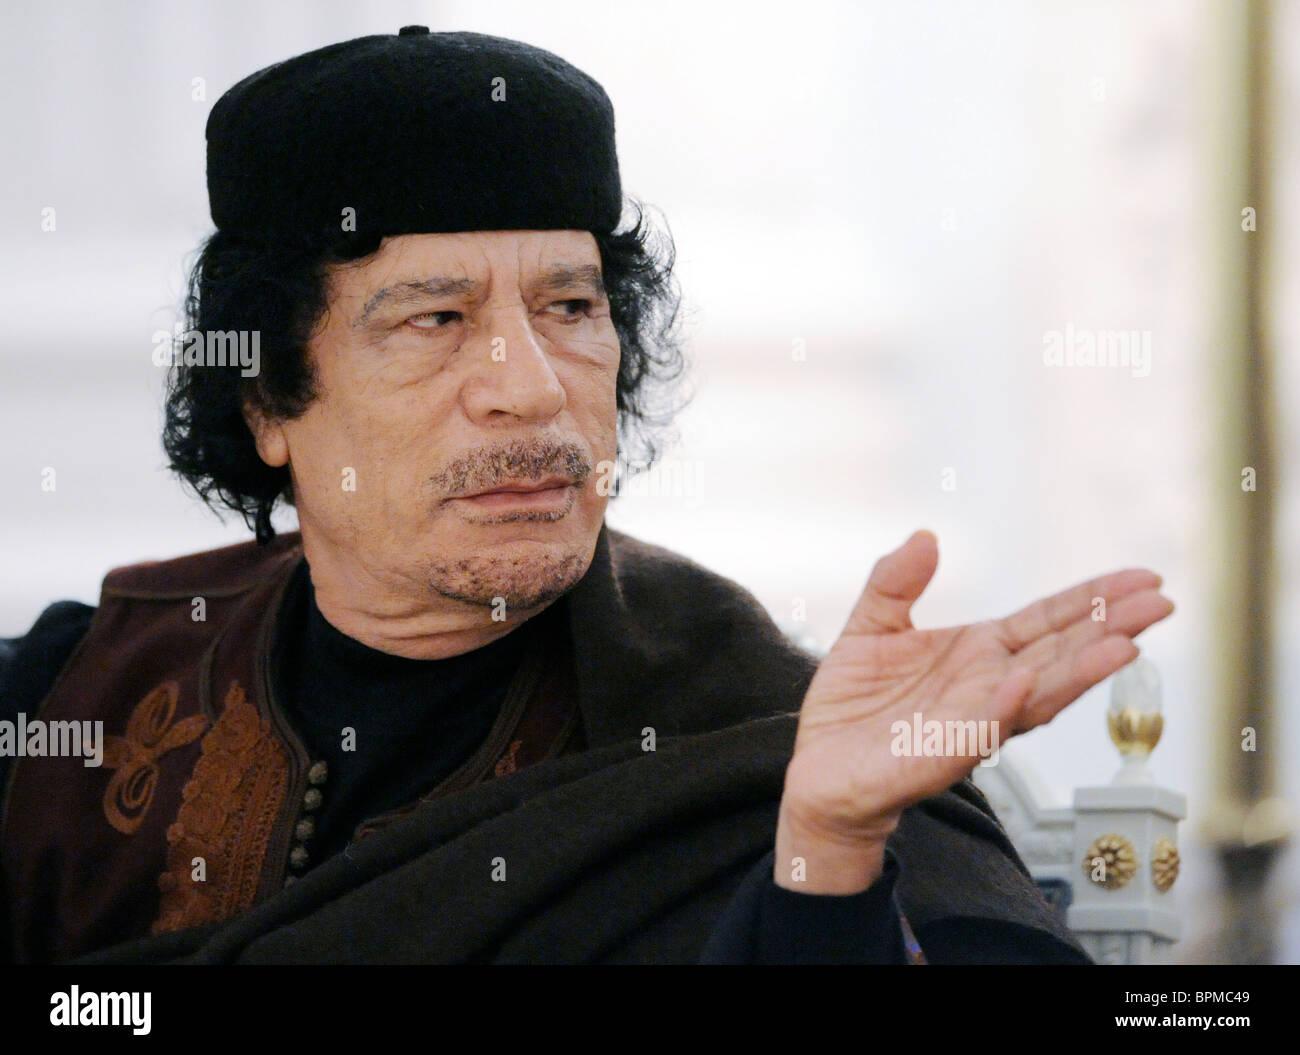 Russian PM meets Libyan leader Muammar Gaddafi - Stock Image